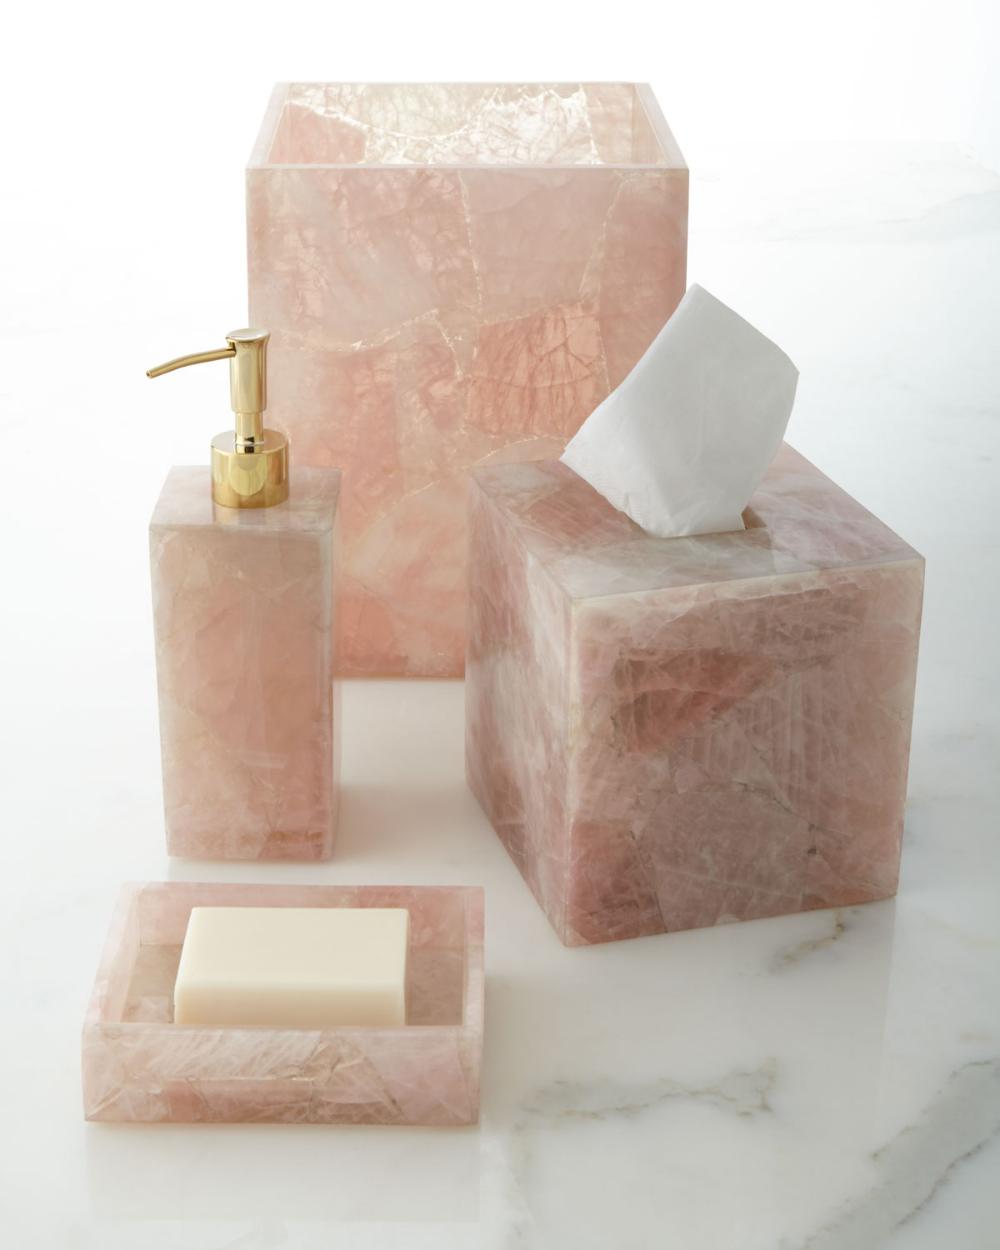 Mike Ally Rose Quartz Vanity Accessories Matching Items Crystal Decor Vanity Accessories Mediterranean Decor